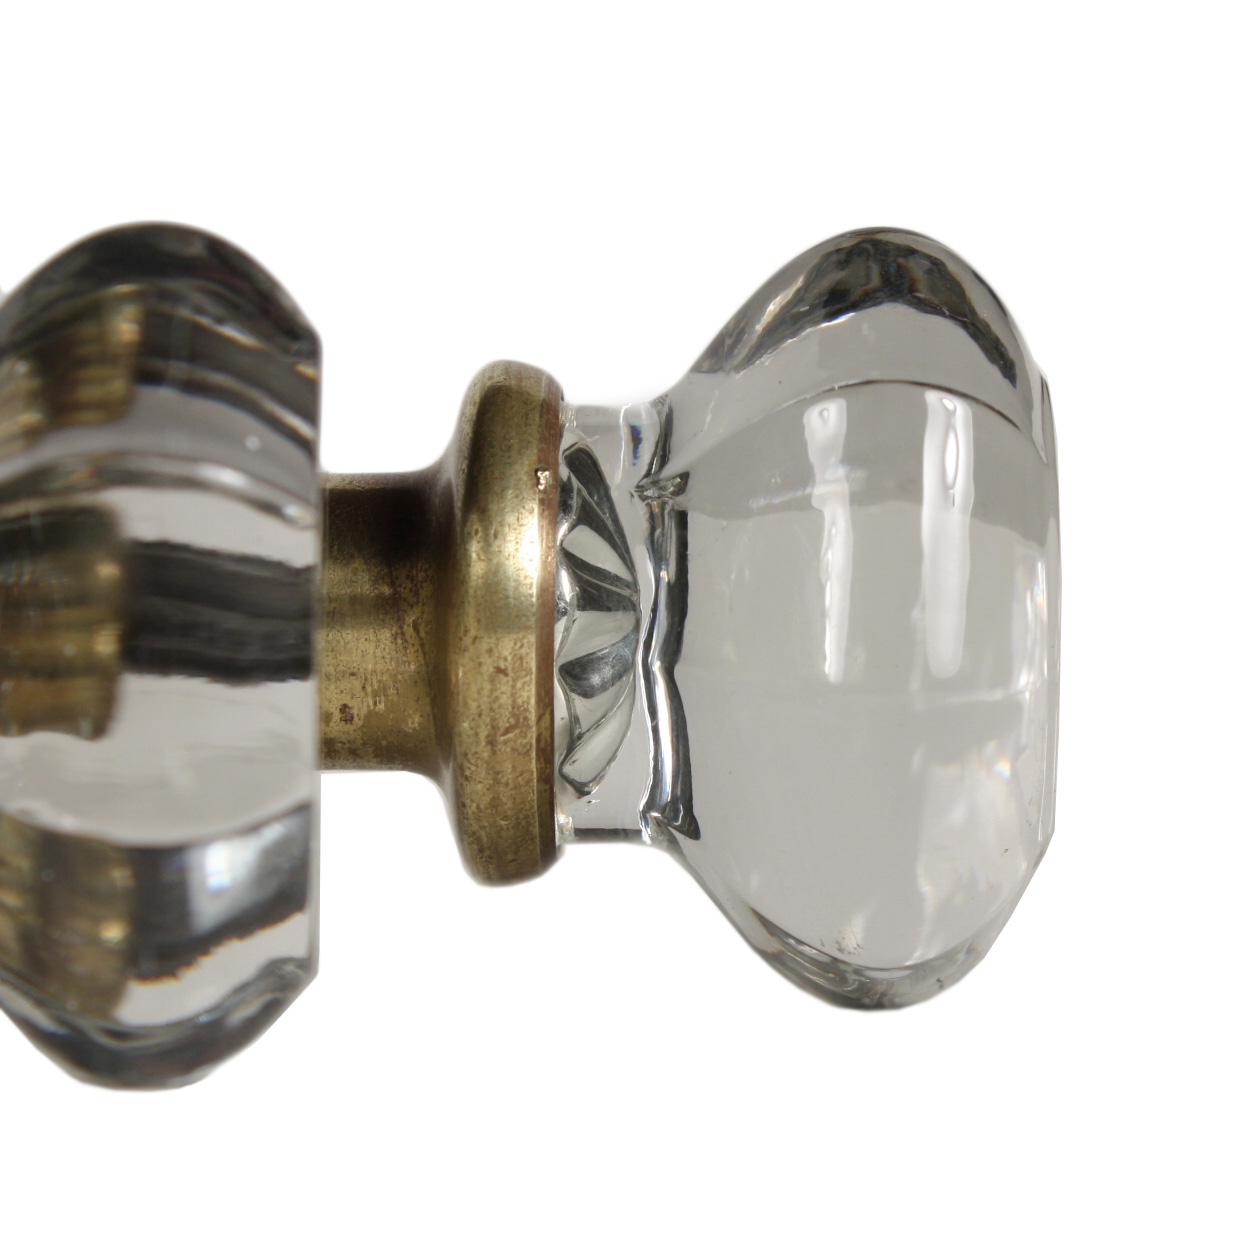 antique glass door knobs for sale photo - 9